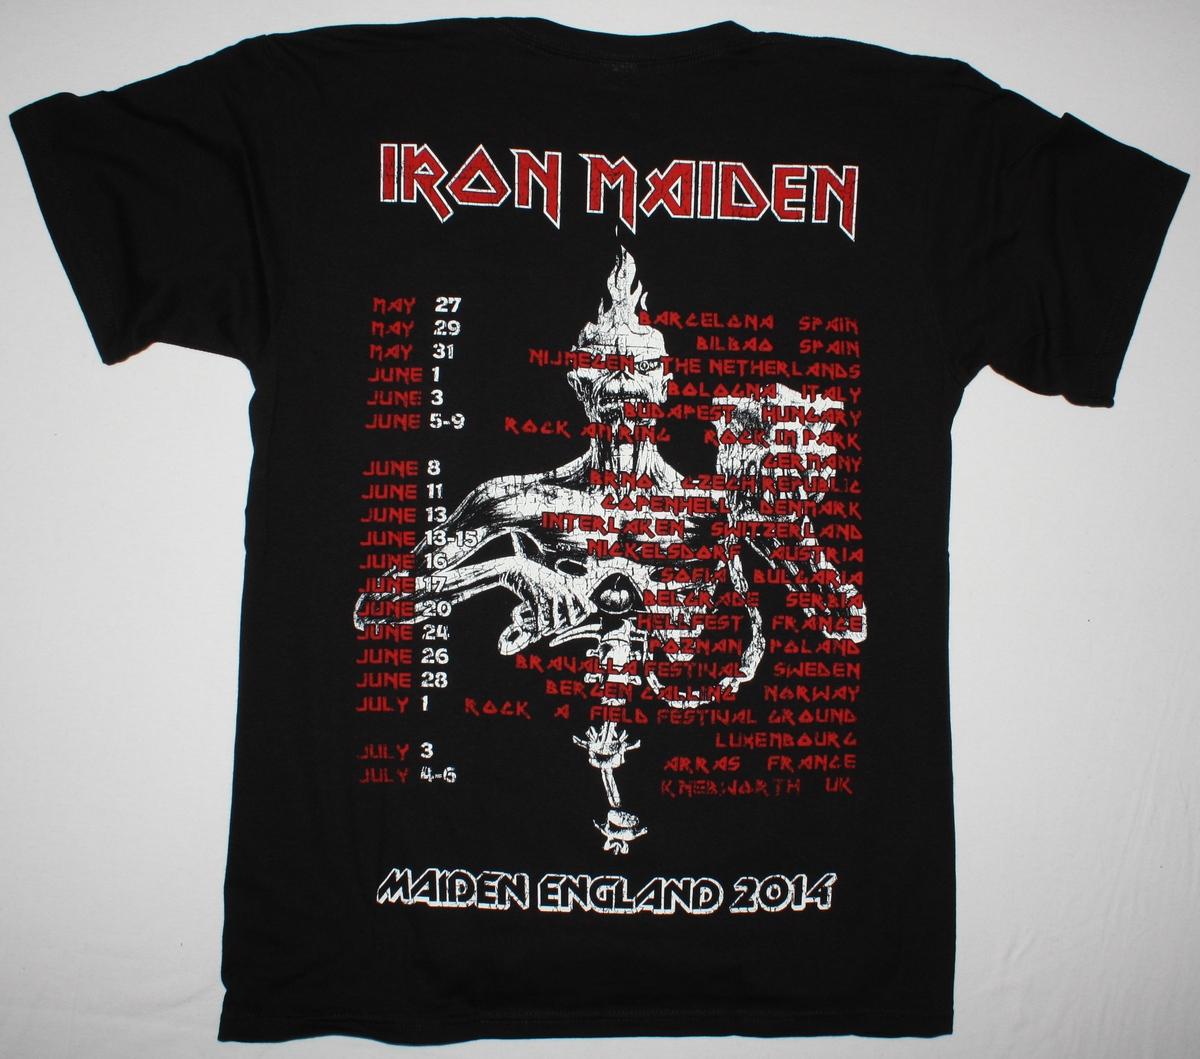 IRON MAIDEN MAIDEN ENGLAND TOUR 2014 NEW BLACK T-SHIRT